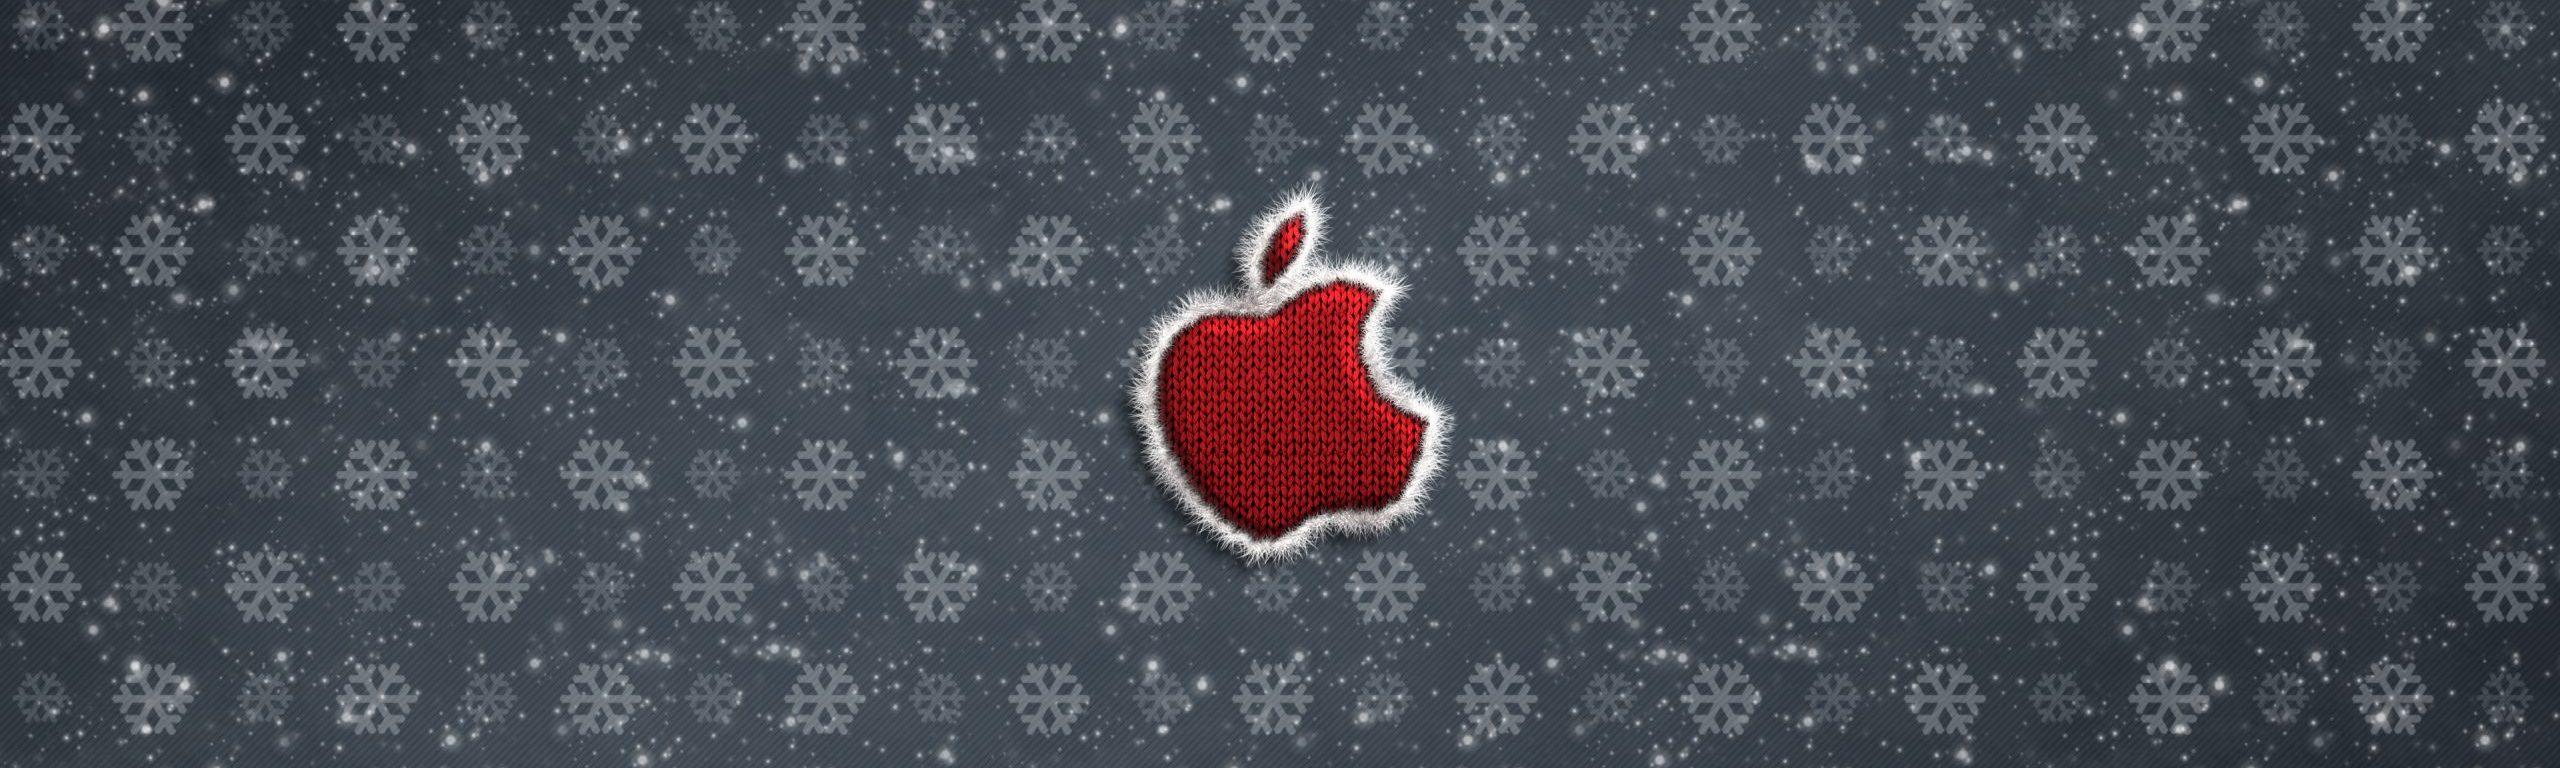 خرید اپل ای دی